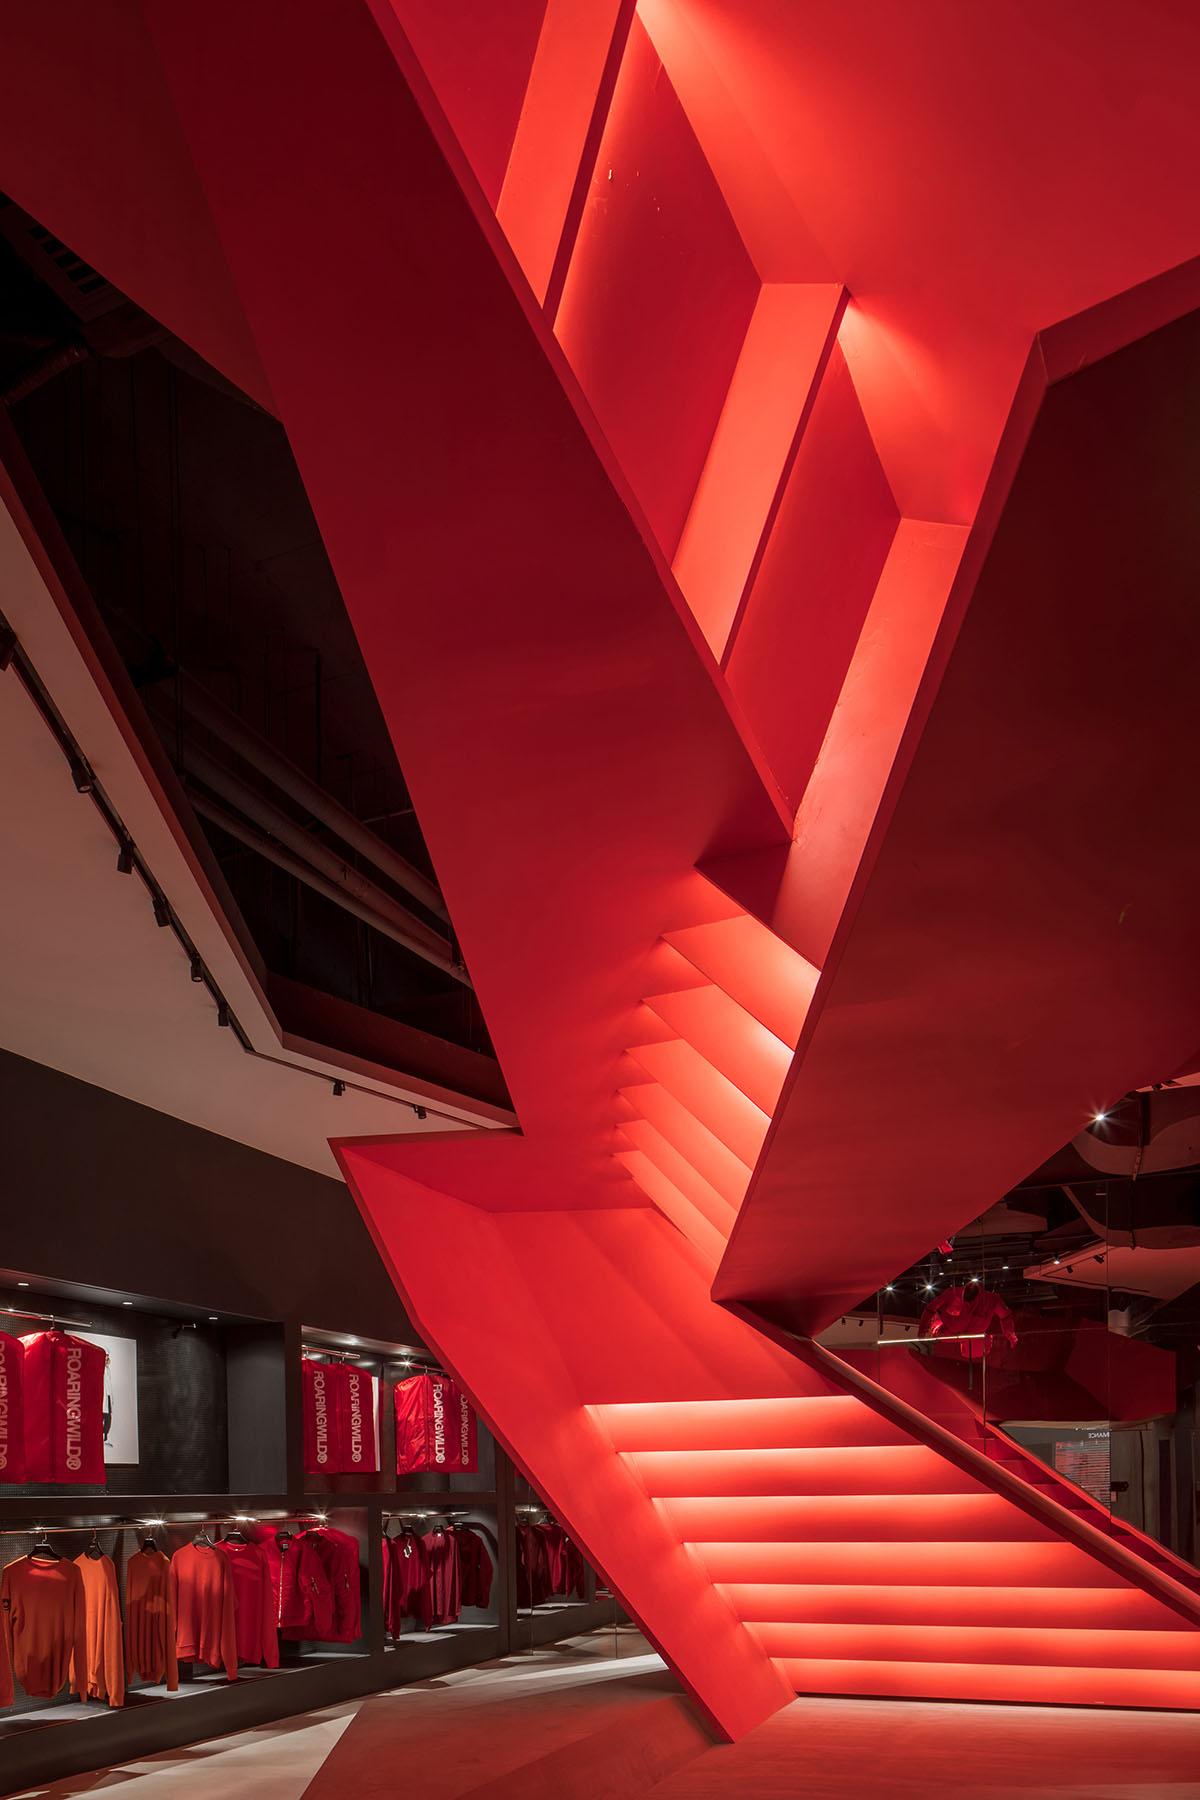 Red interior photo